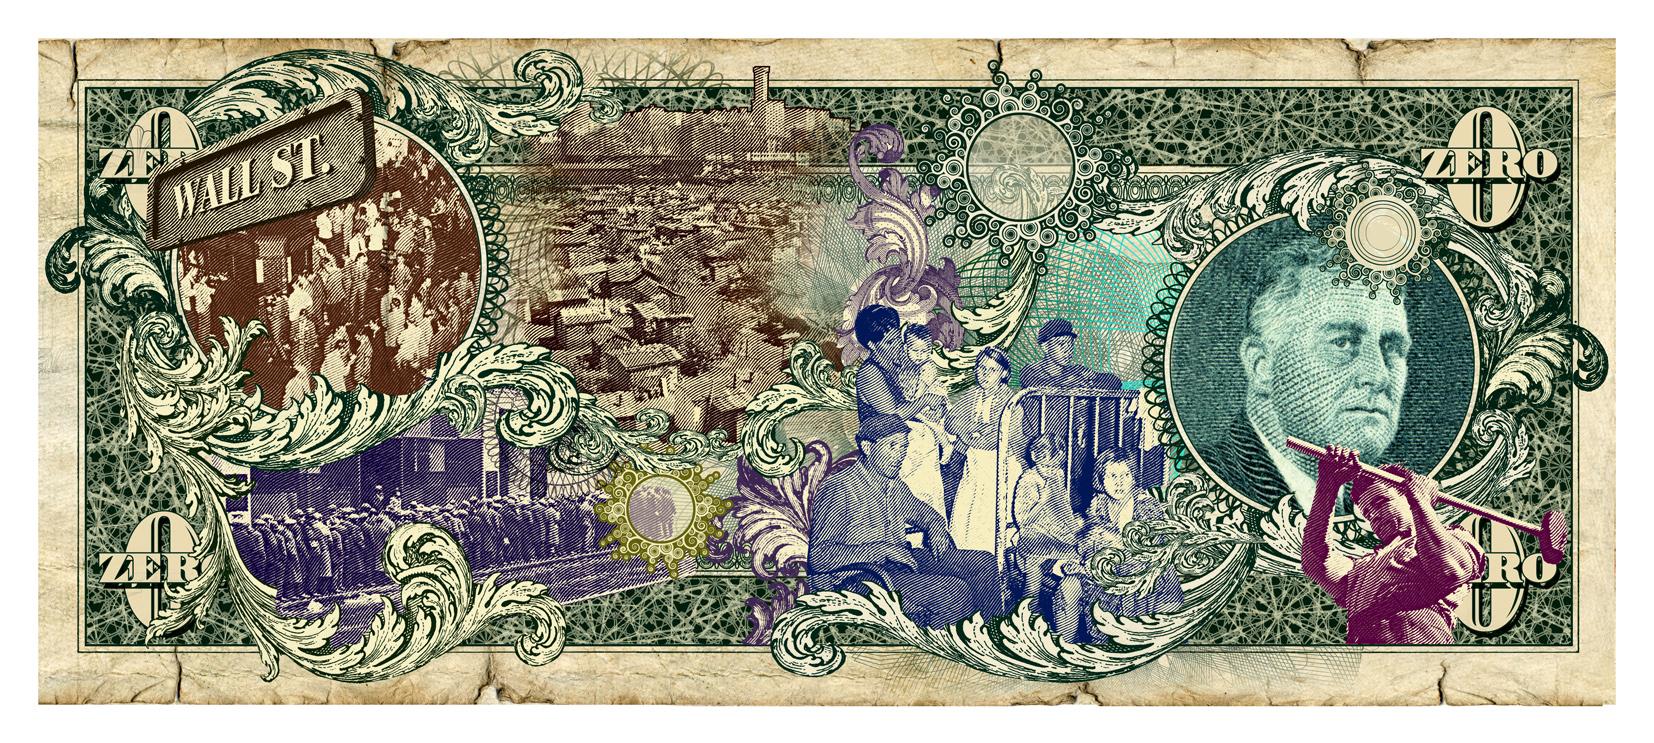 Banknote America History